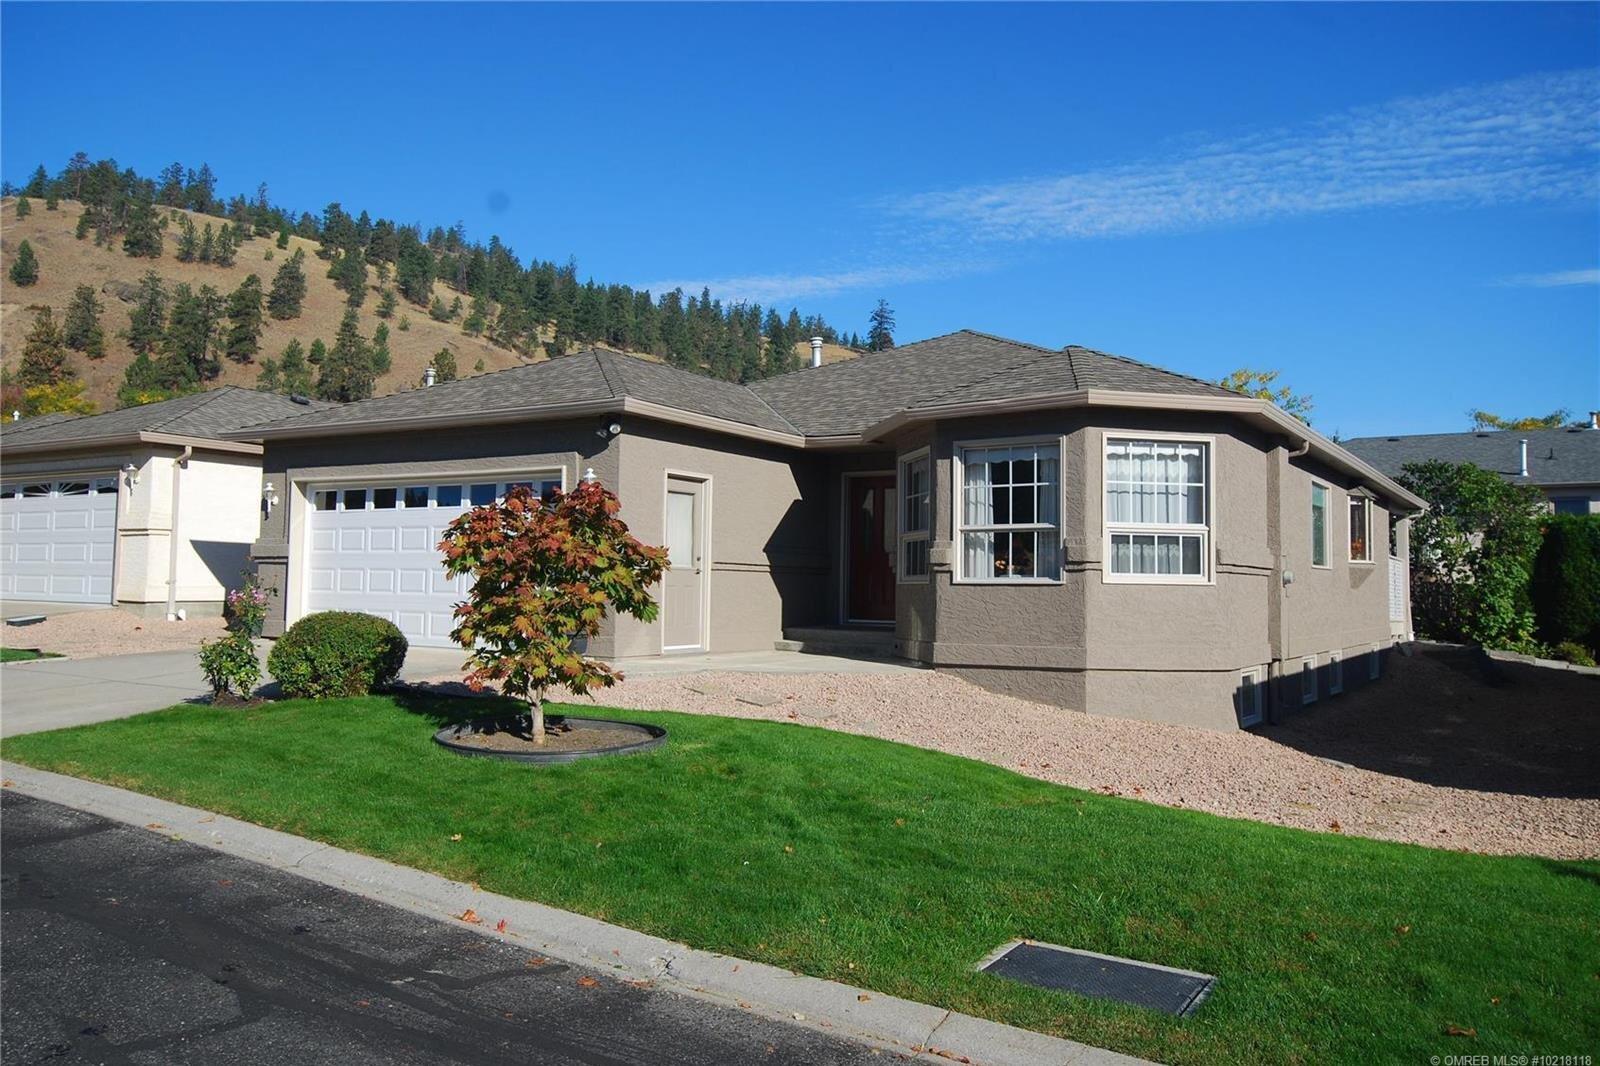 House for sale at 615 Glenmeadows Rd Unit 27 Kelowna British Columbia - MLS: 10218118